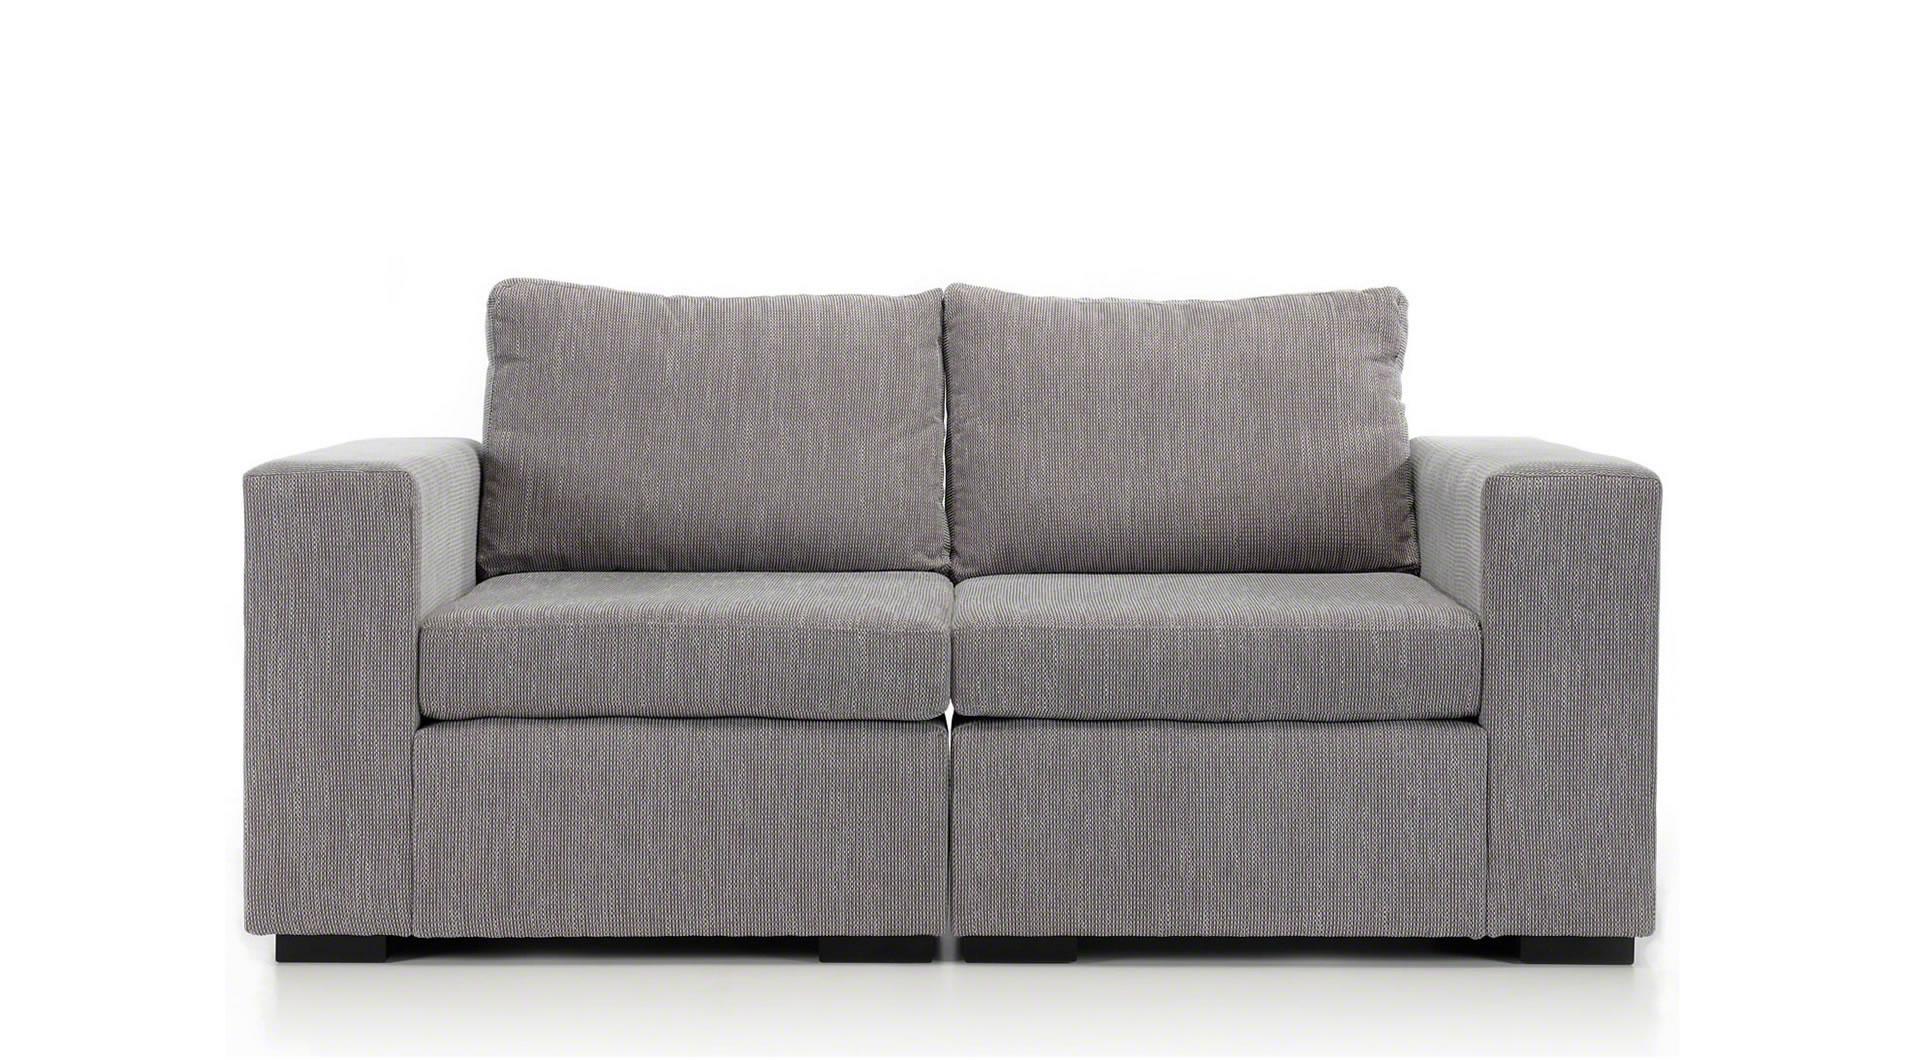 light grey sofa bed uk england abbie 3 seater mysmallspace